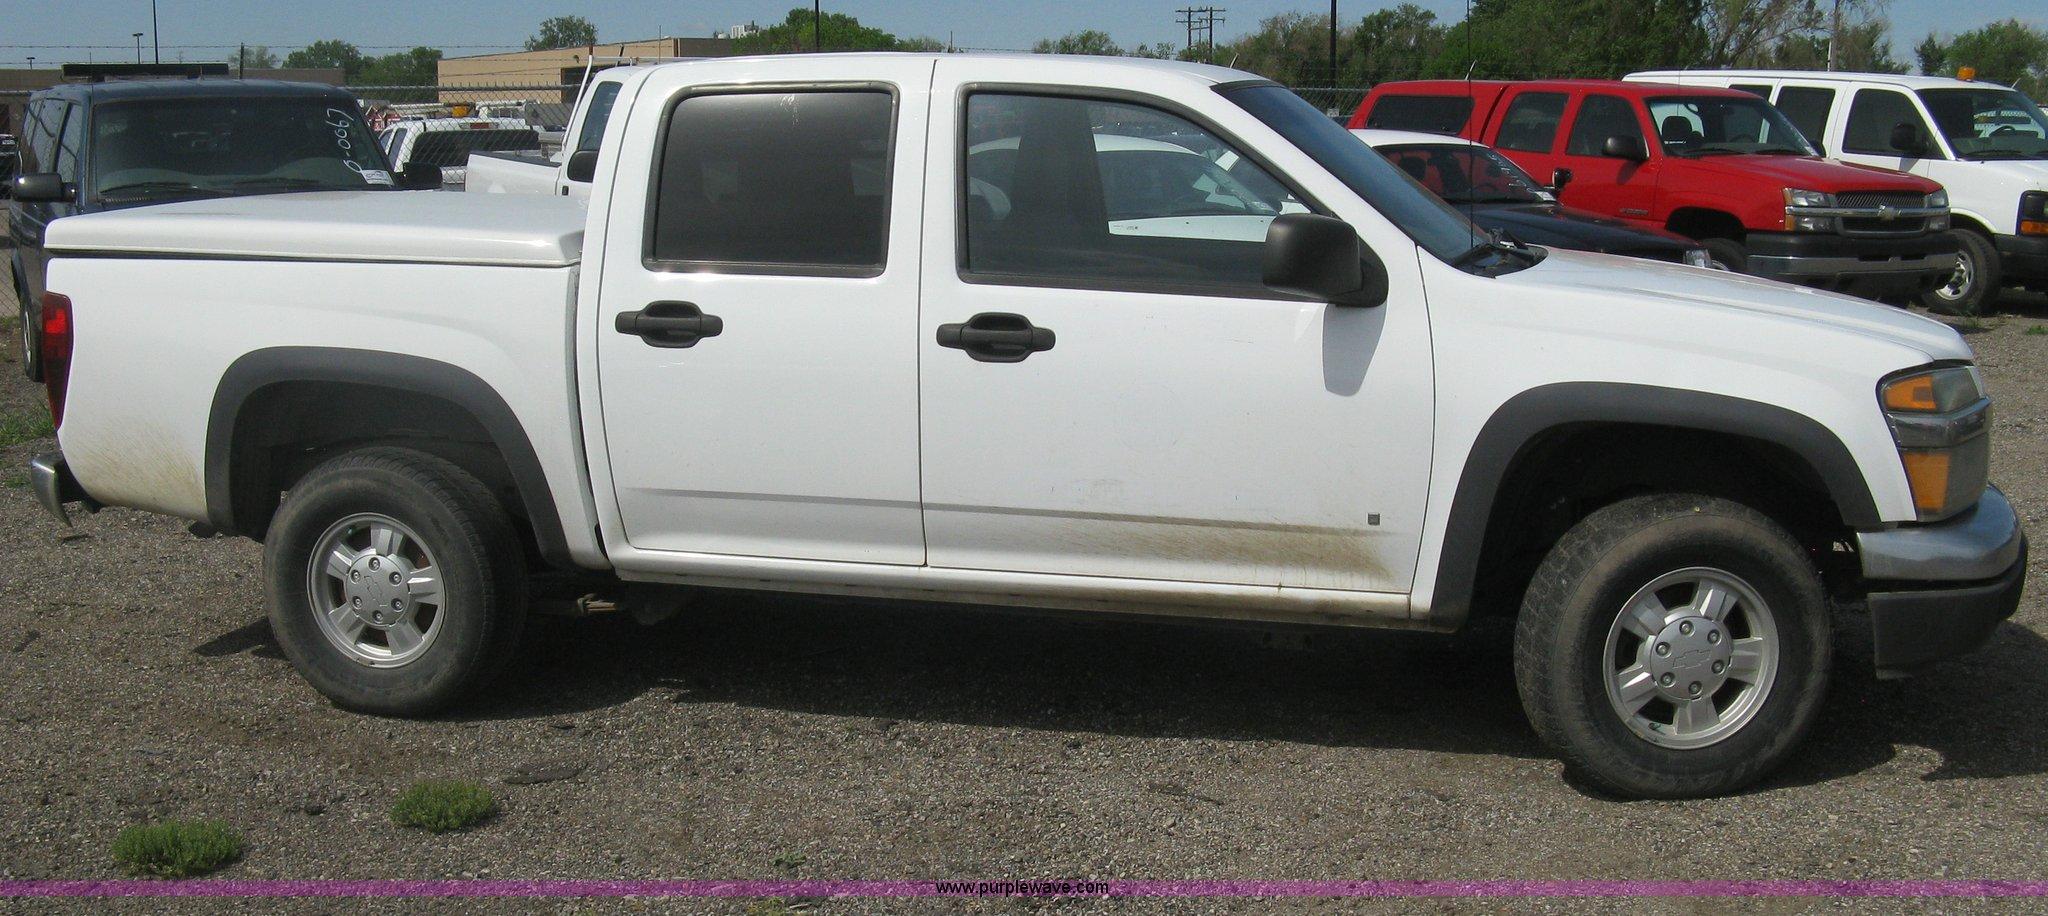 Colorado 2006 chevrolet colorado : 2006 Chevrolet Colorado Crew Cab pickup truck | Item G8267 |...